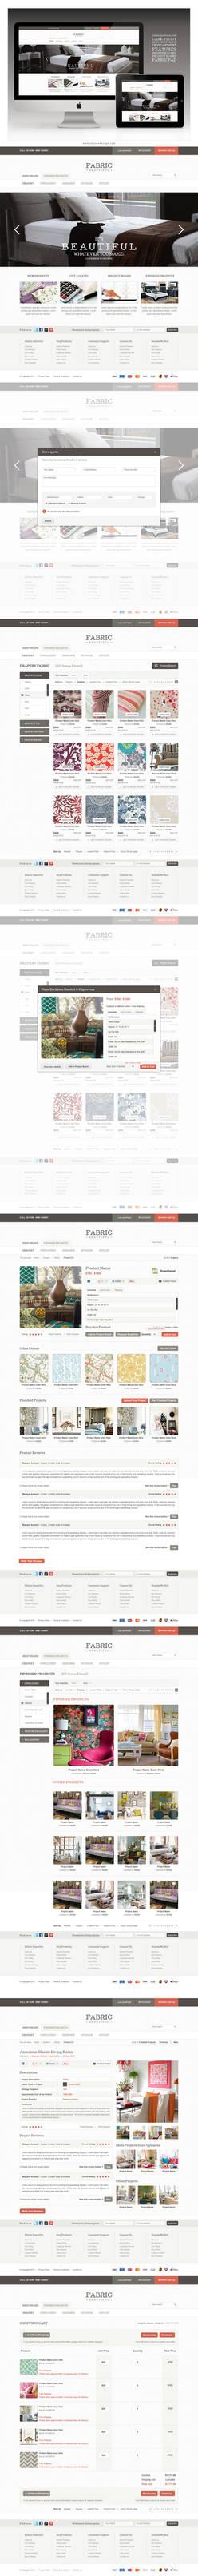 Fabric Beautiful (Online Shopping Store)